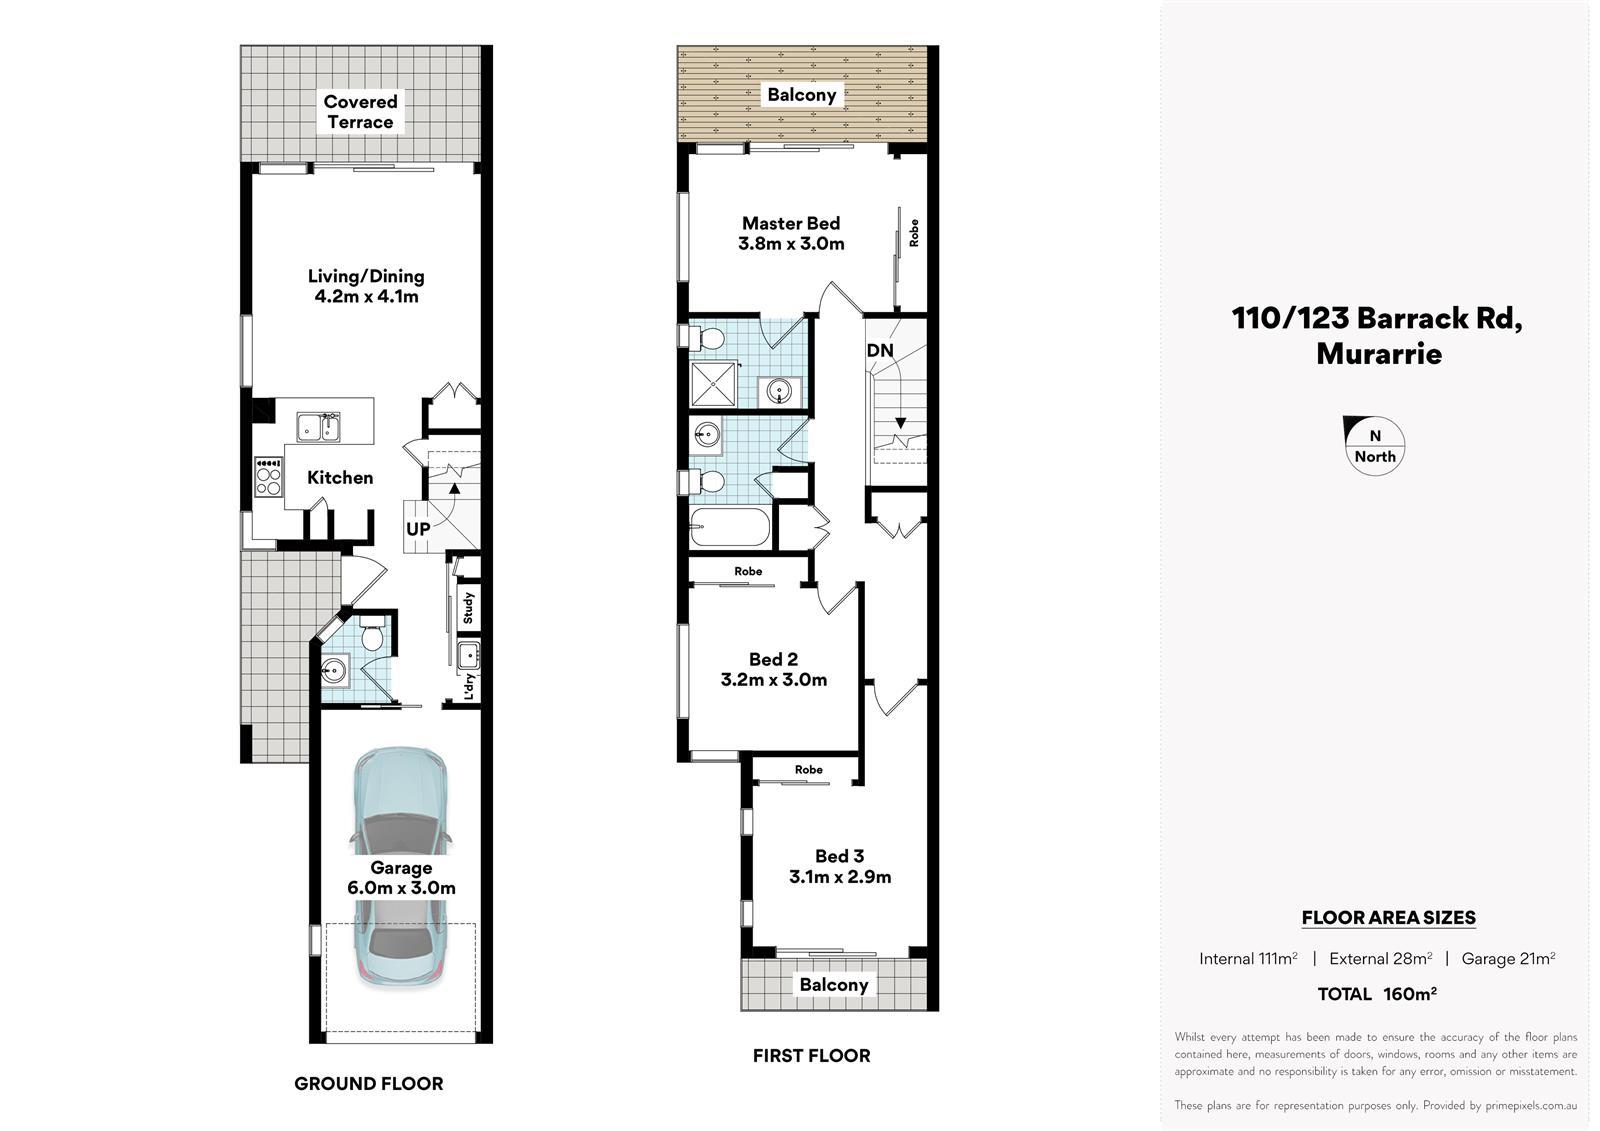 110 / 123 Barrack Rd MURARRIE QLD 4172 Floorplan 1